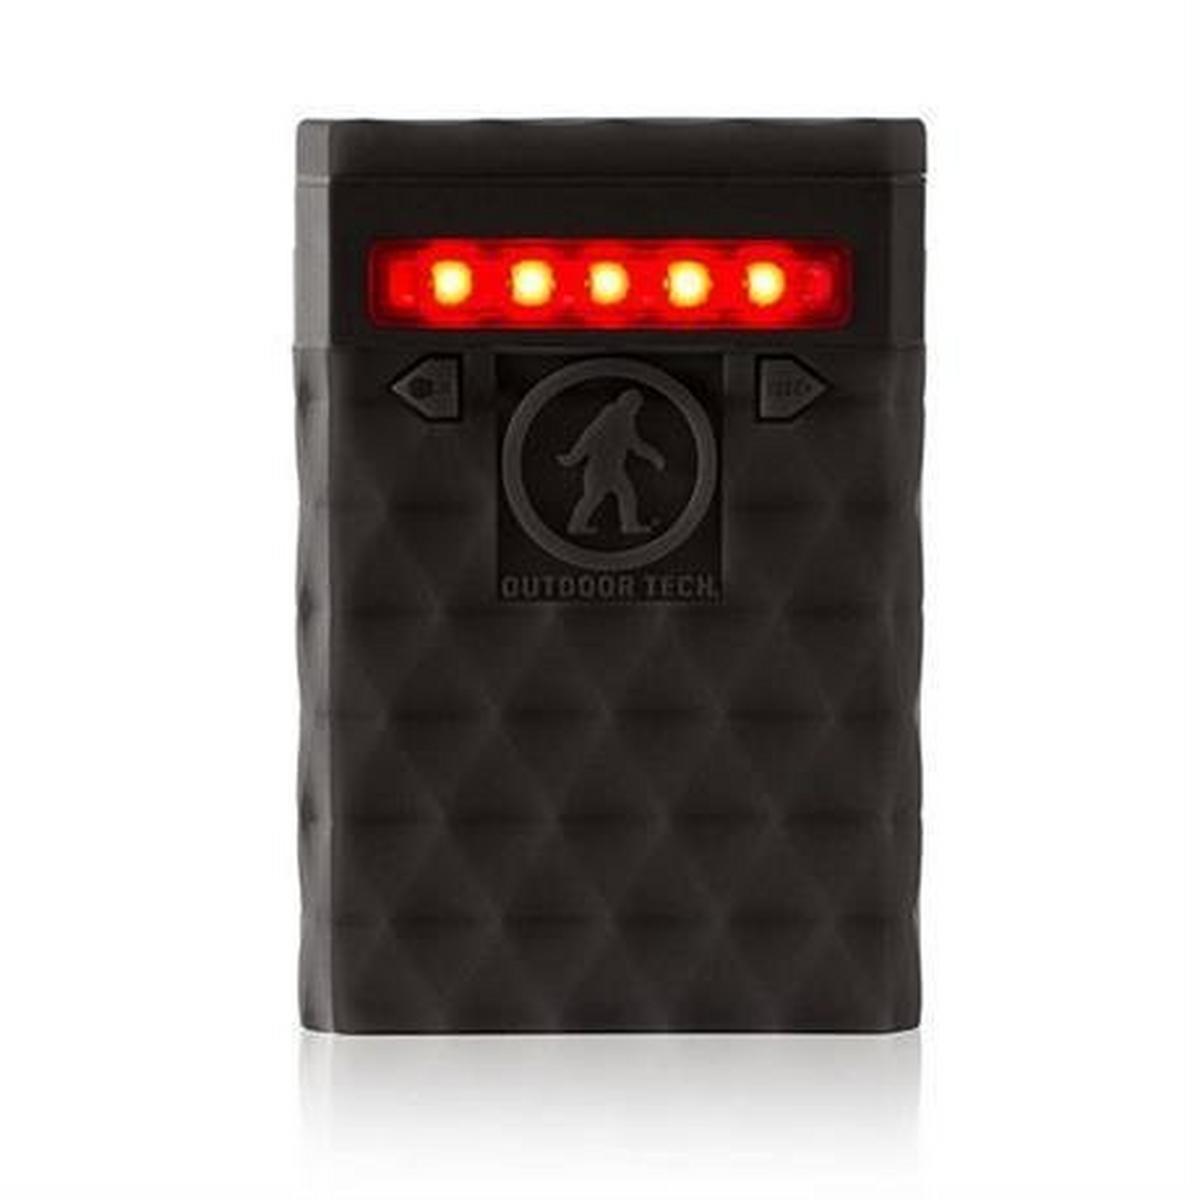 Outdoor Tech Kodiak Plus 2.0 Powerbank Black 10000 mAh